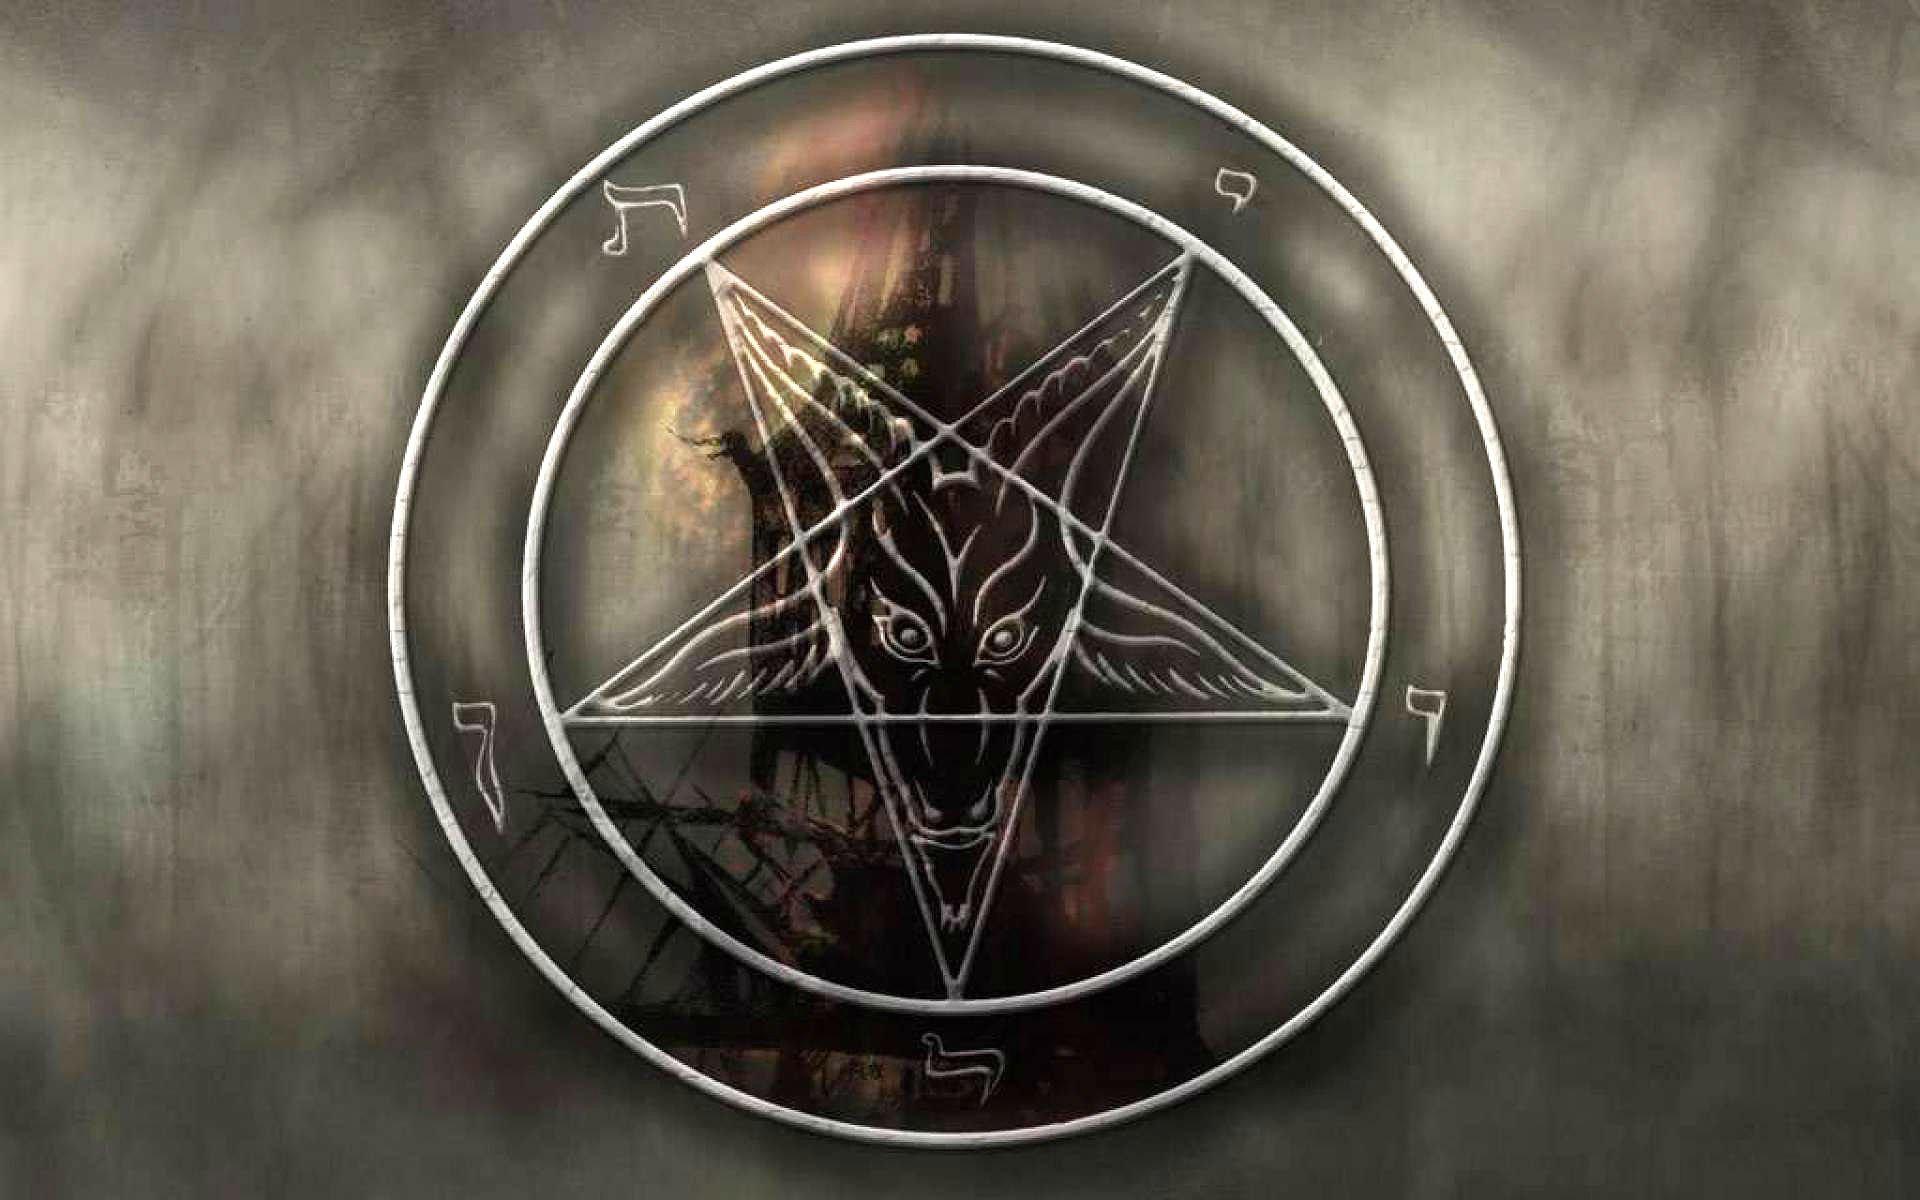 Dark evil occult satanic satan demon wallpaper 1920x1200 696204 dark evil occult satanic satan demon wallpaper 1920x1200 696204 wallpaperup voltagebd Image collections